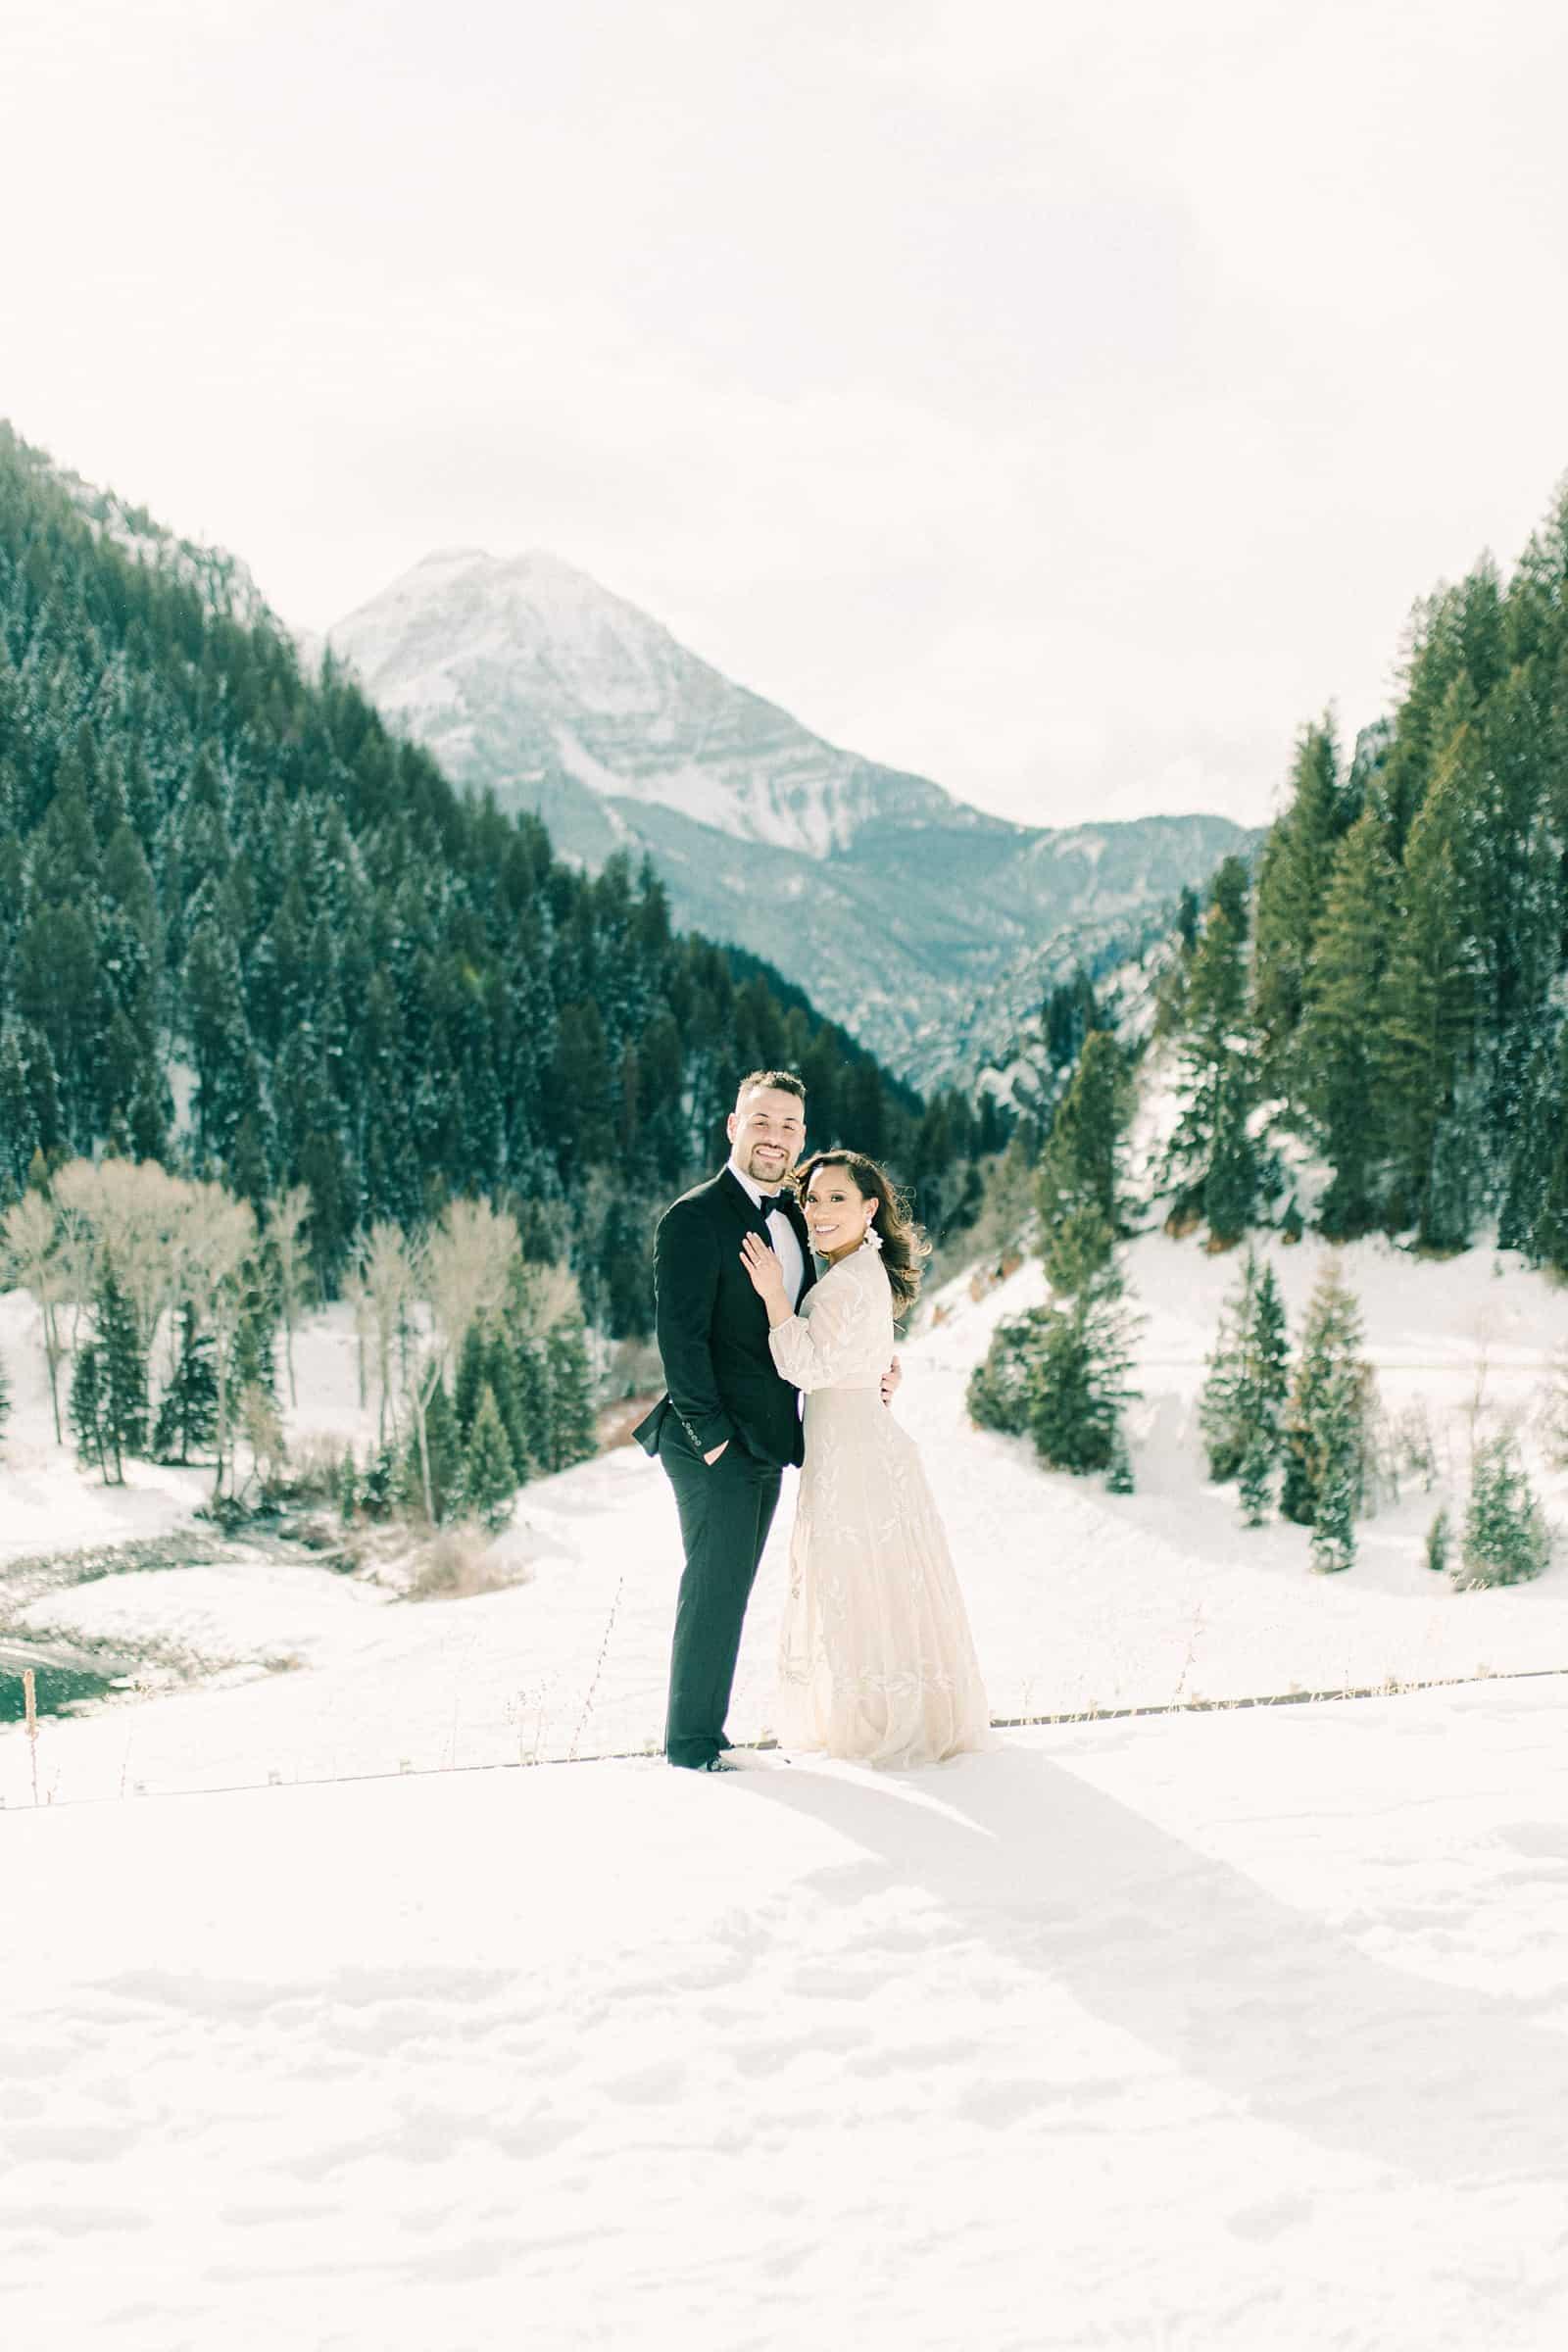 Utah mountain winter wedding bride and groom